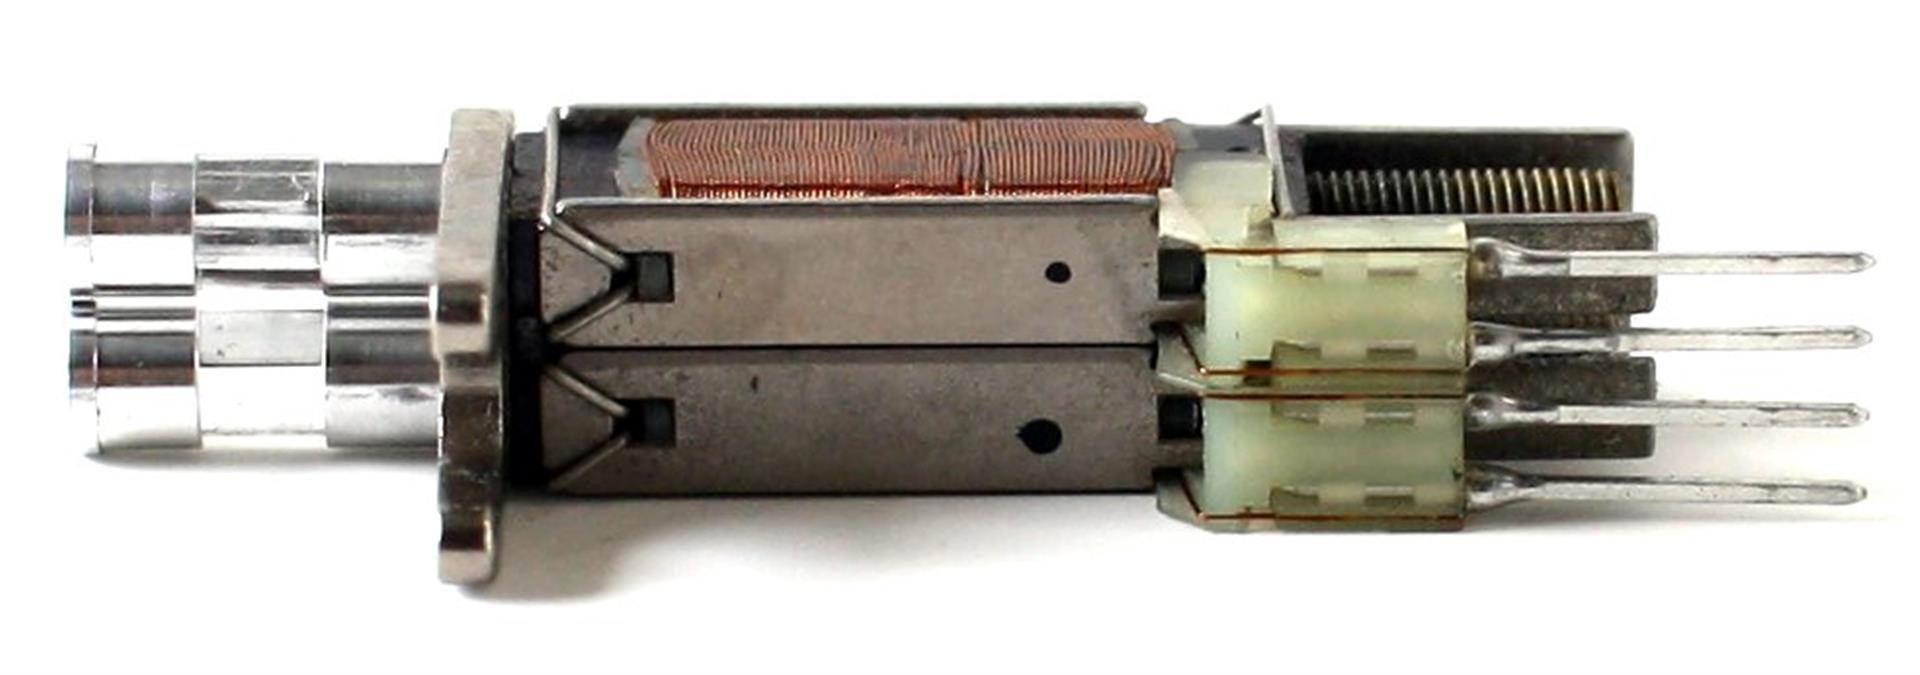 Genicom - Printhead - 4D0850G01